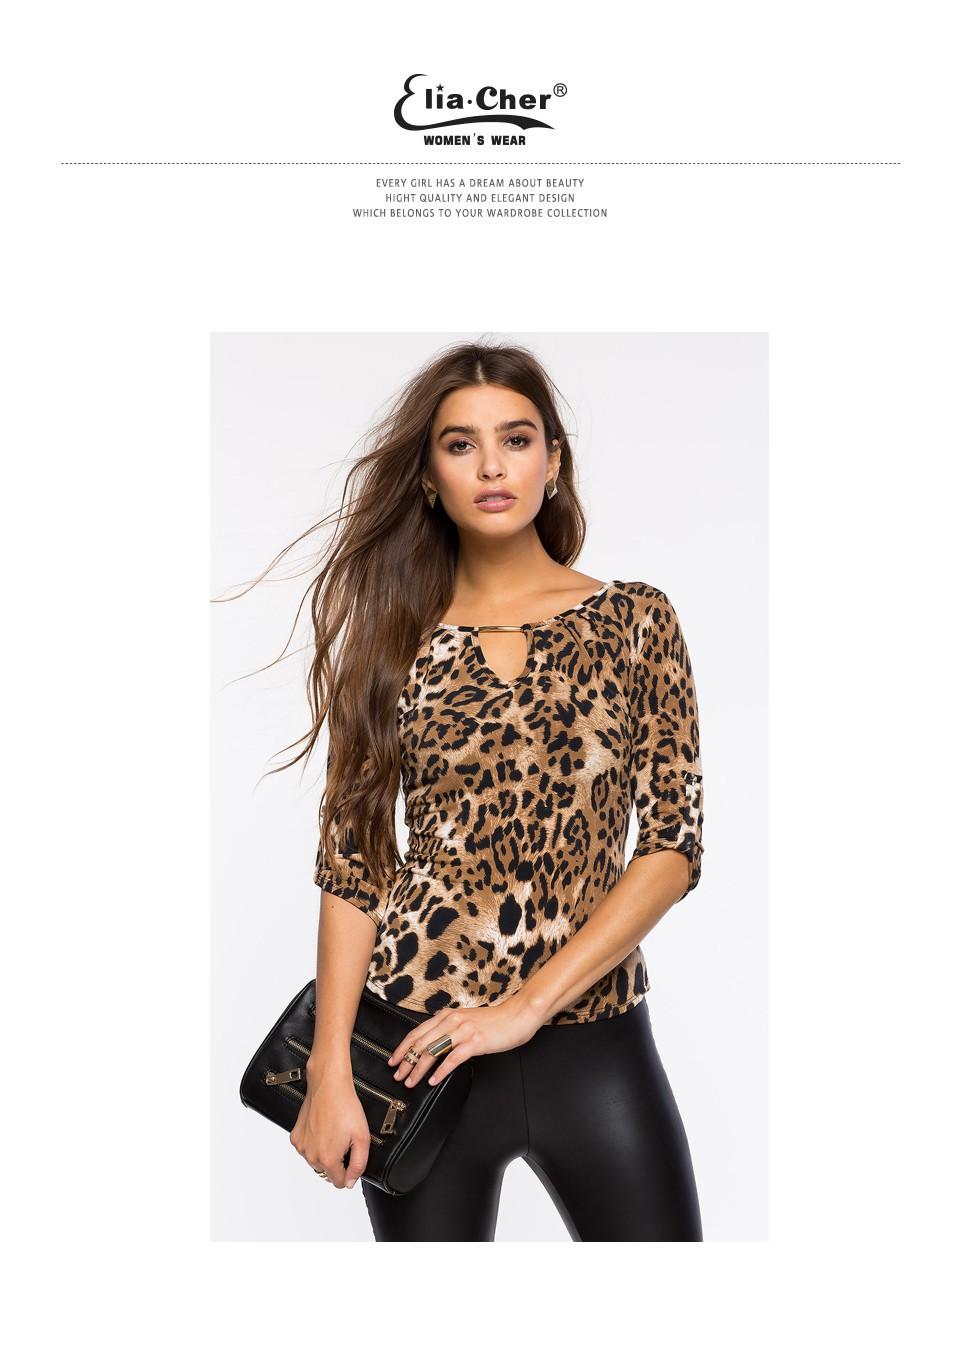 <font><b>Blouse</b></font> <font><b>Women</b></font> Tops 2016 Half Sleeve <font><b>Women</b></font> Shirt Elia Cher Plus Size Casual <font><b>Women</b></font> Clothing Lady Leopard Print <font><b>Blouses</b></font> Blusas 8231